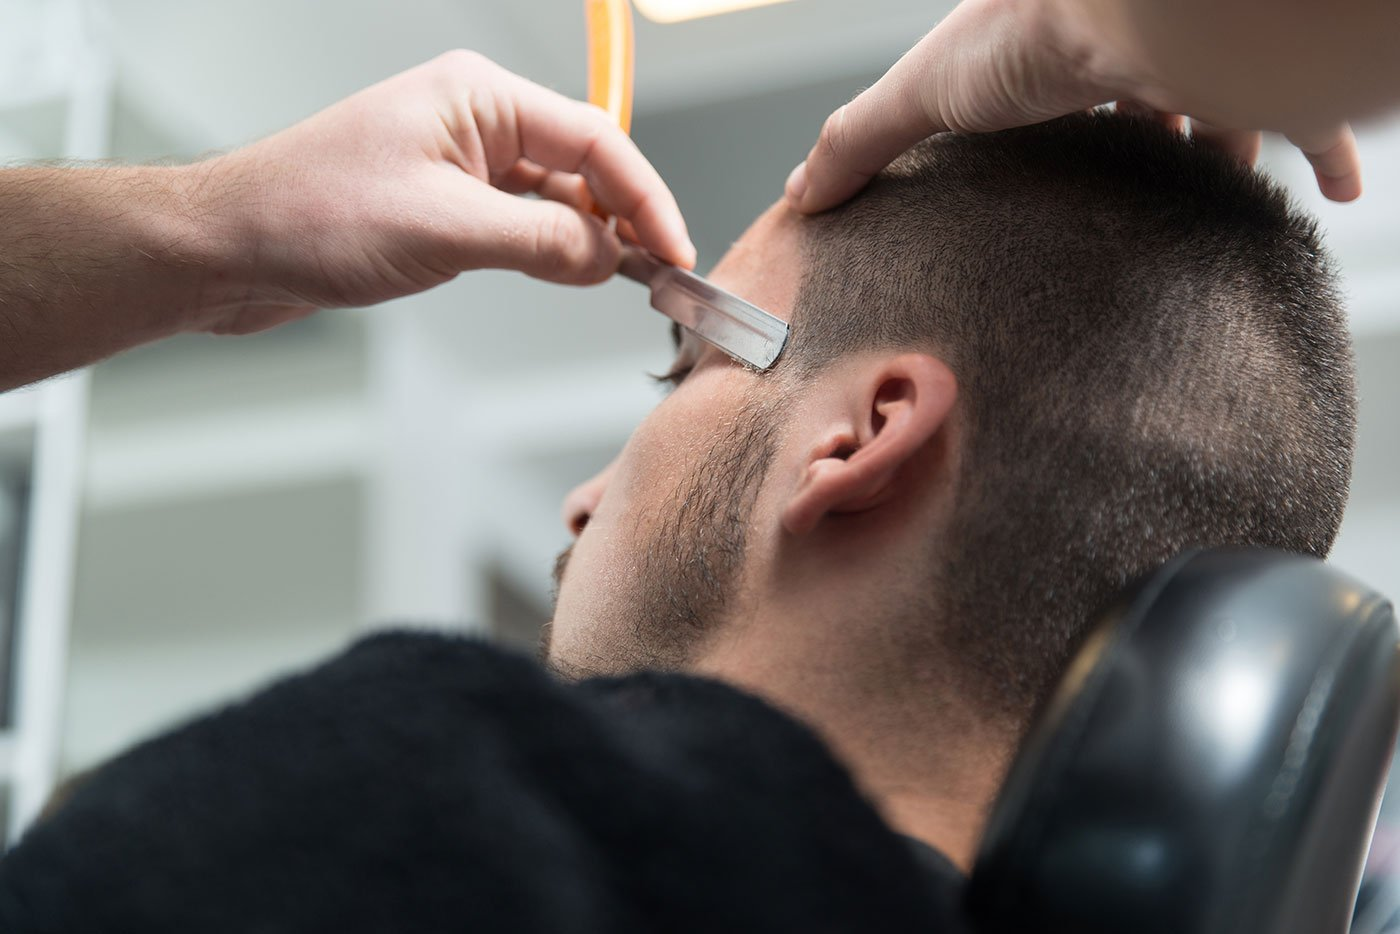 Un parrucchiere mentre sistema acconciatura di un uomo con uno razzaio